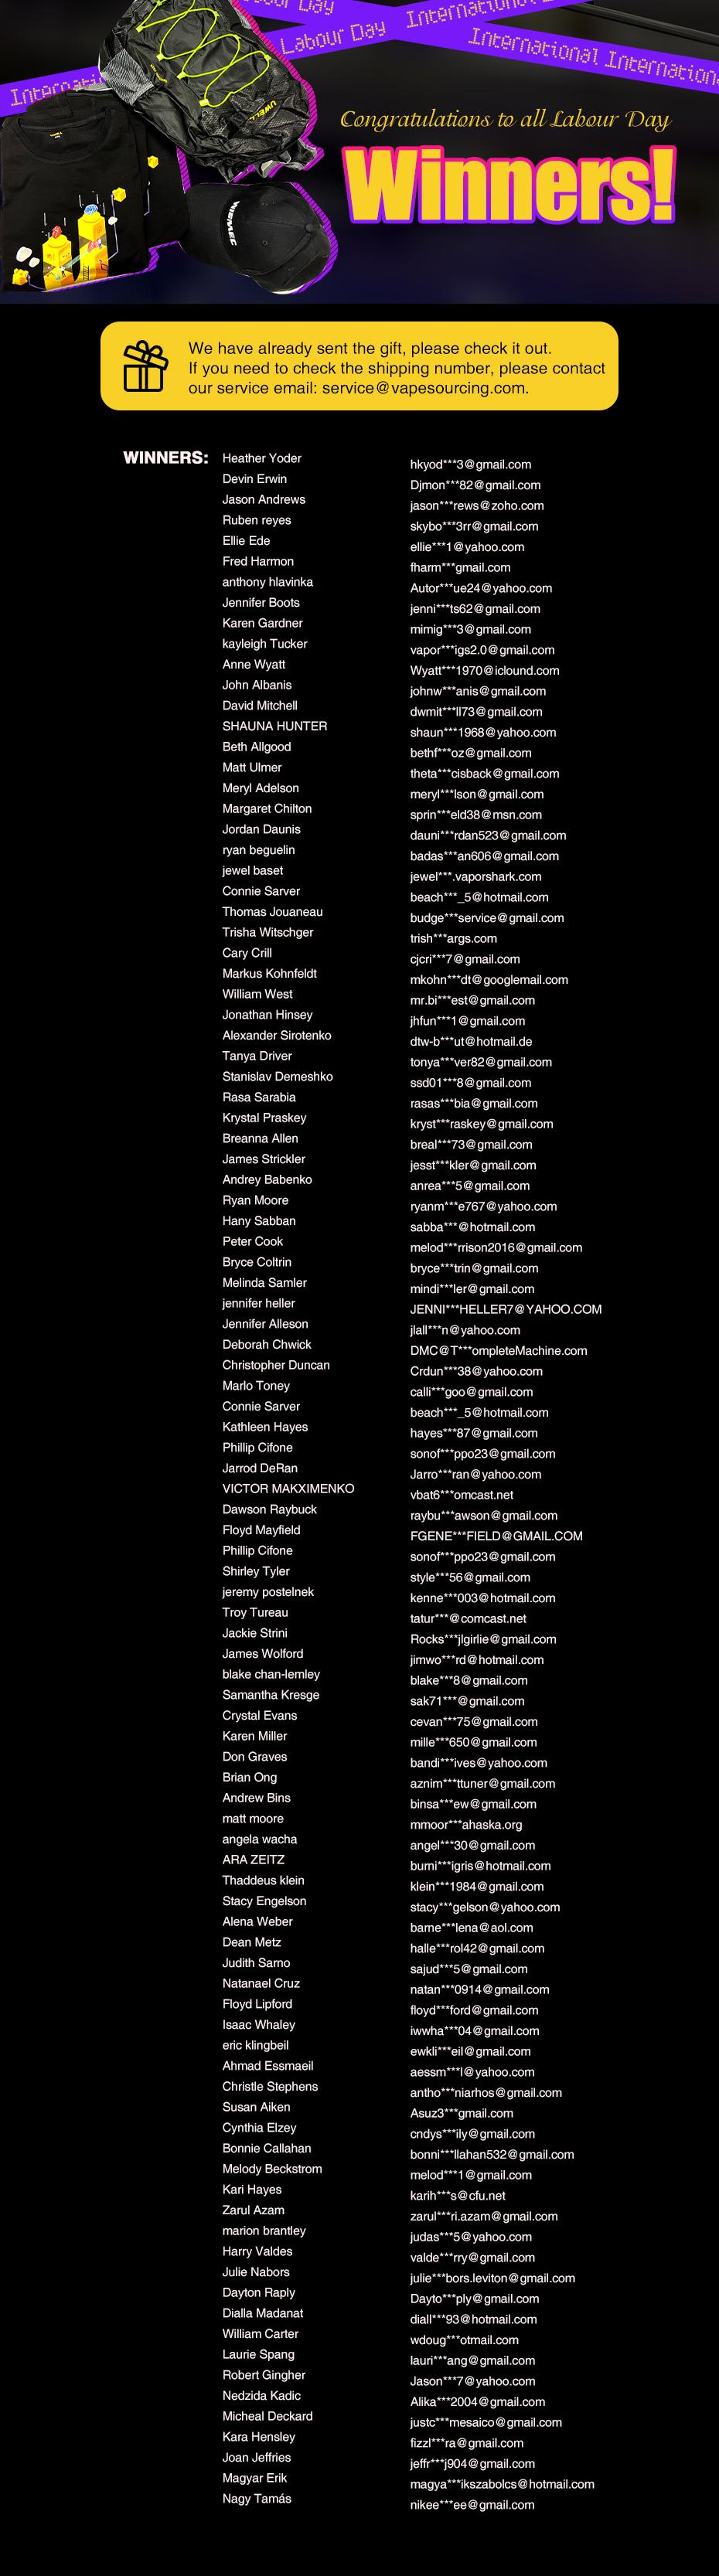 Labour Day winners list